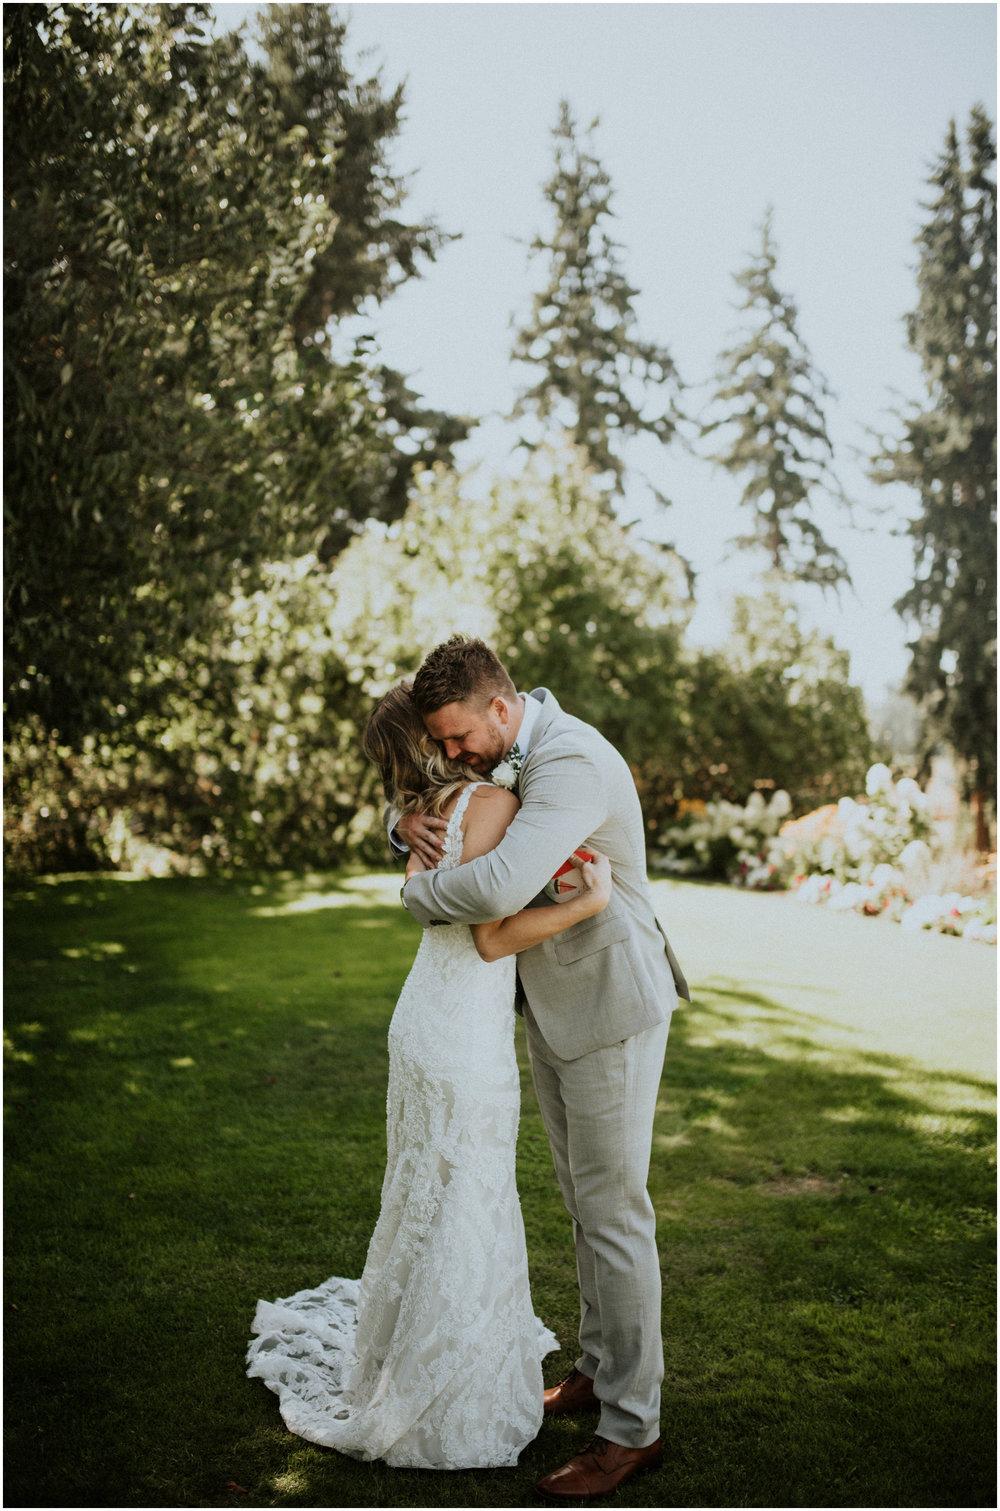 mona-and-matthew-the-kelley-farm-wedding-seattle-washington-wedding-photographer-36.jpg